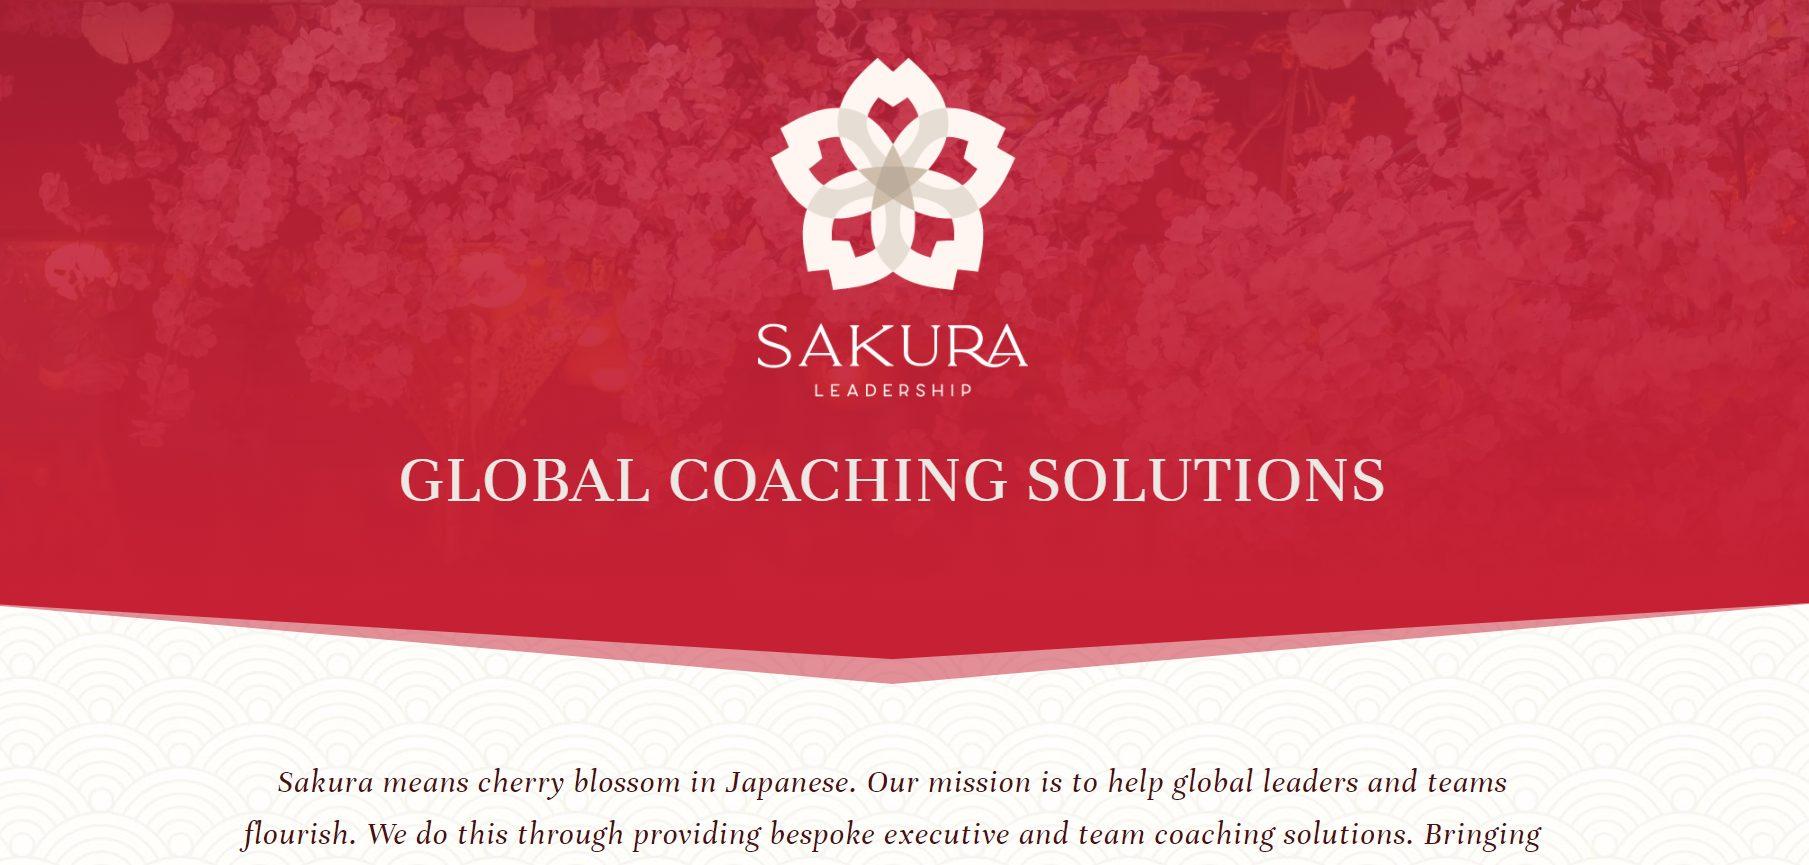 divi-wordpress-portfolio-sakura-leadership-super-divine-web-design